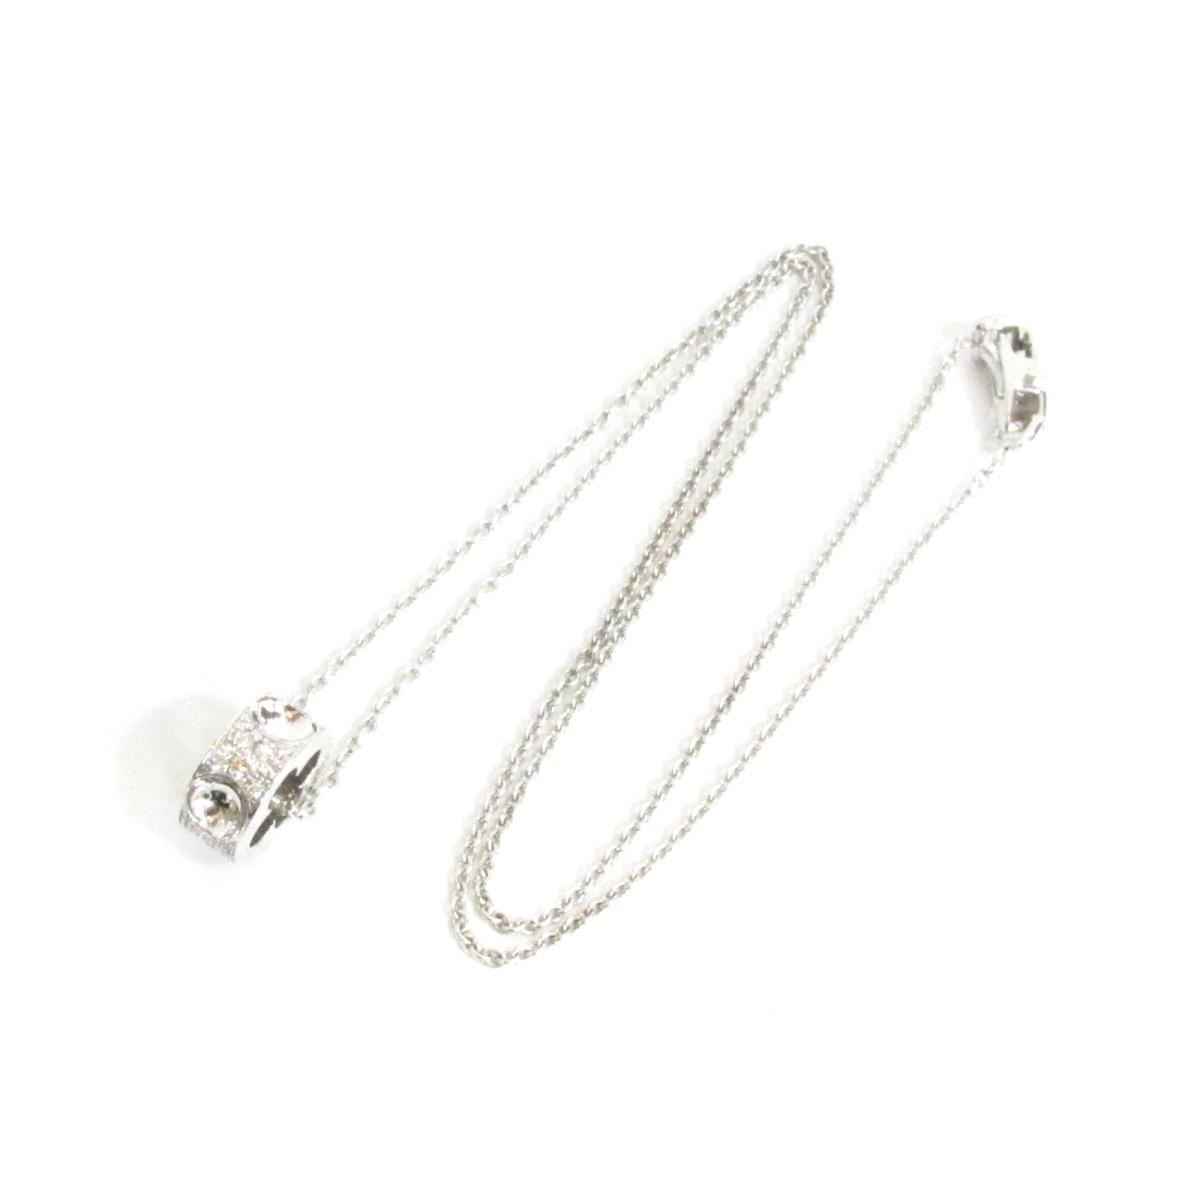 62eb86fcad85 Auth LOUIS VUITTON Pandantif Empreinte Necklace pendant K18WG white gold  diamond